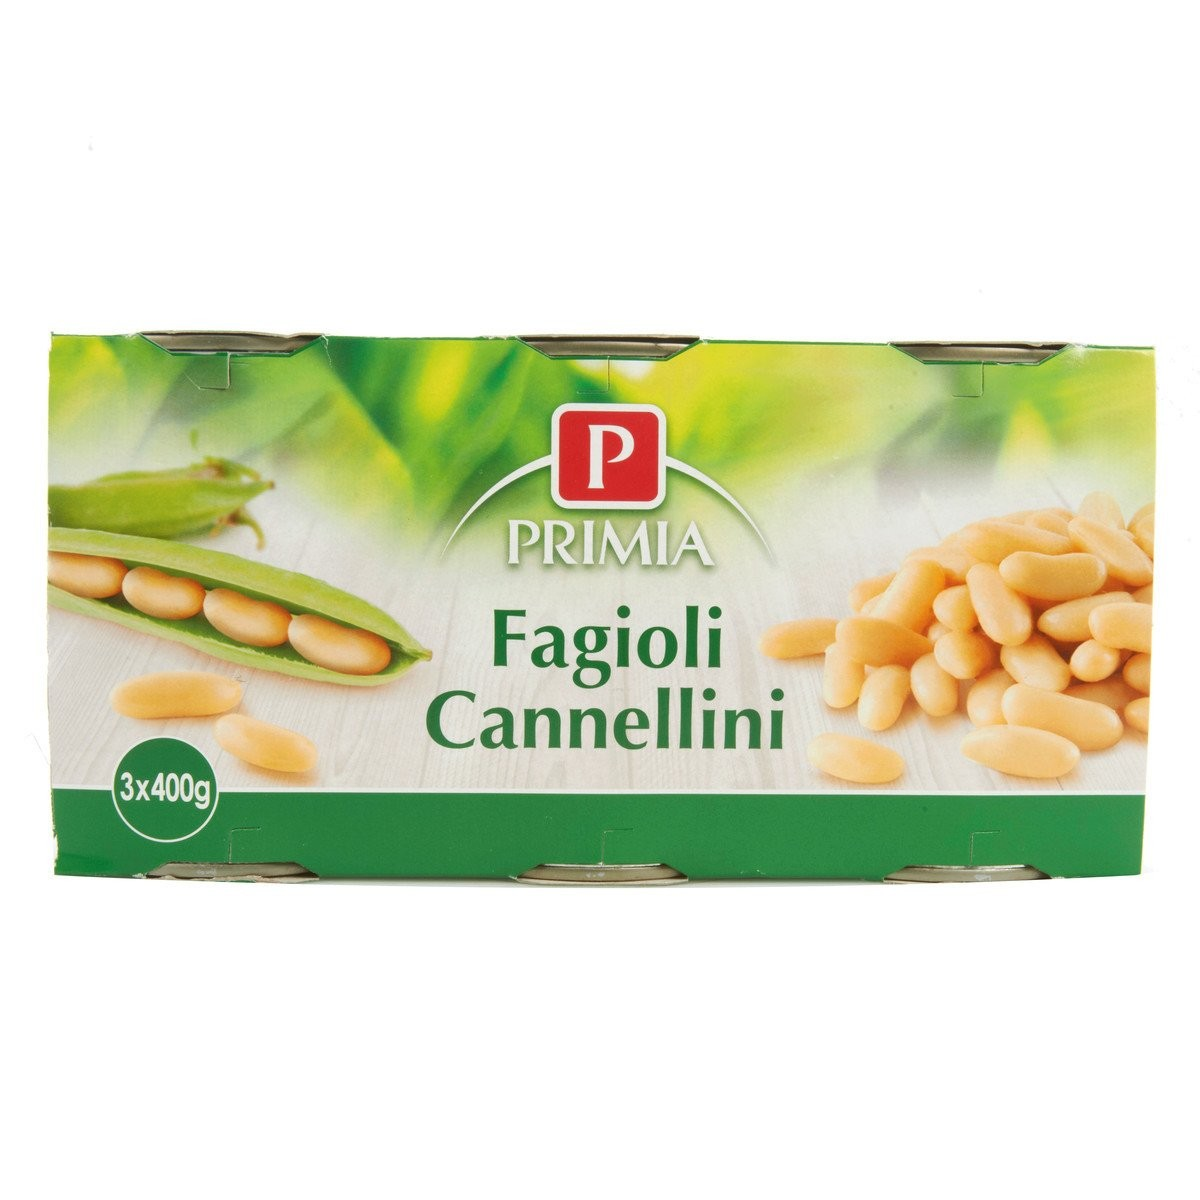 Primia Fagioli cannellini